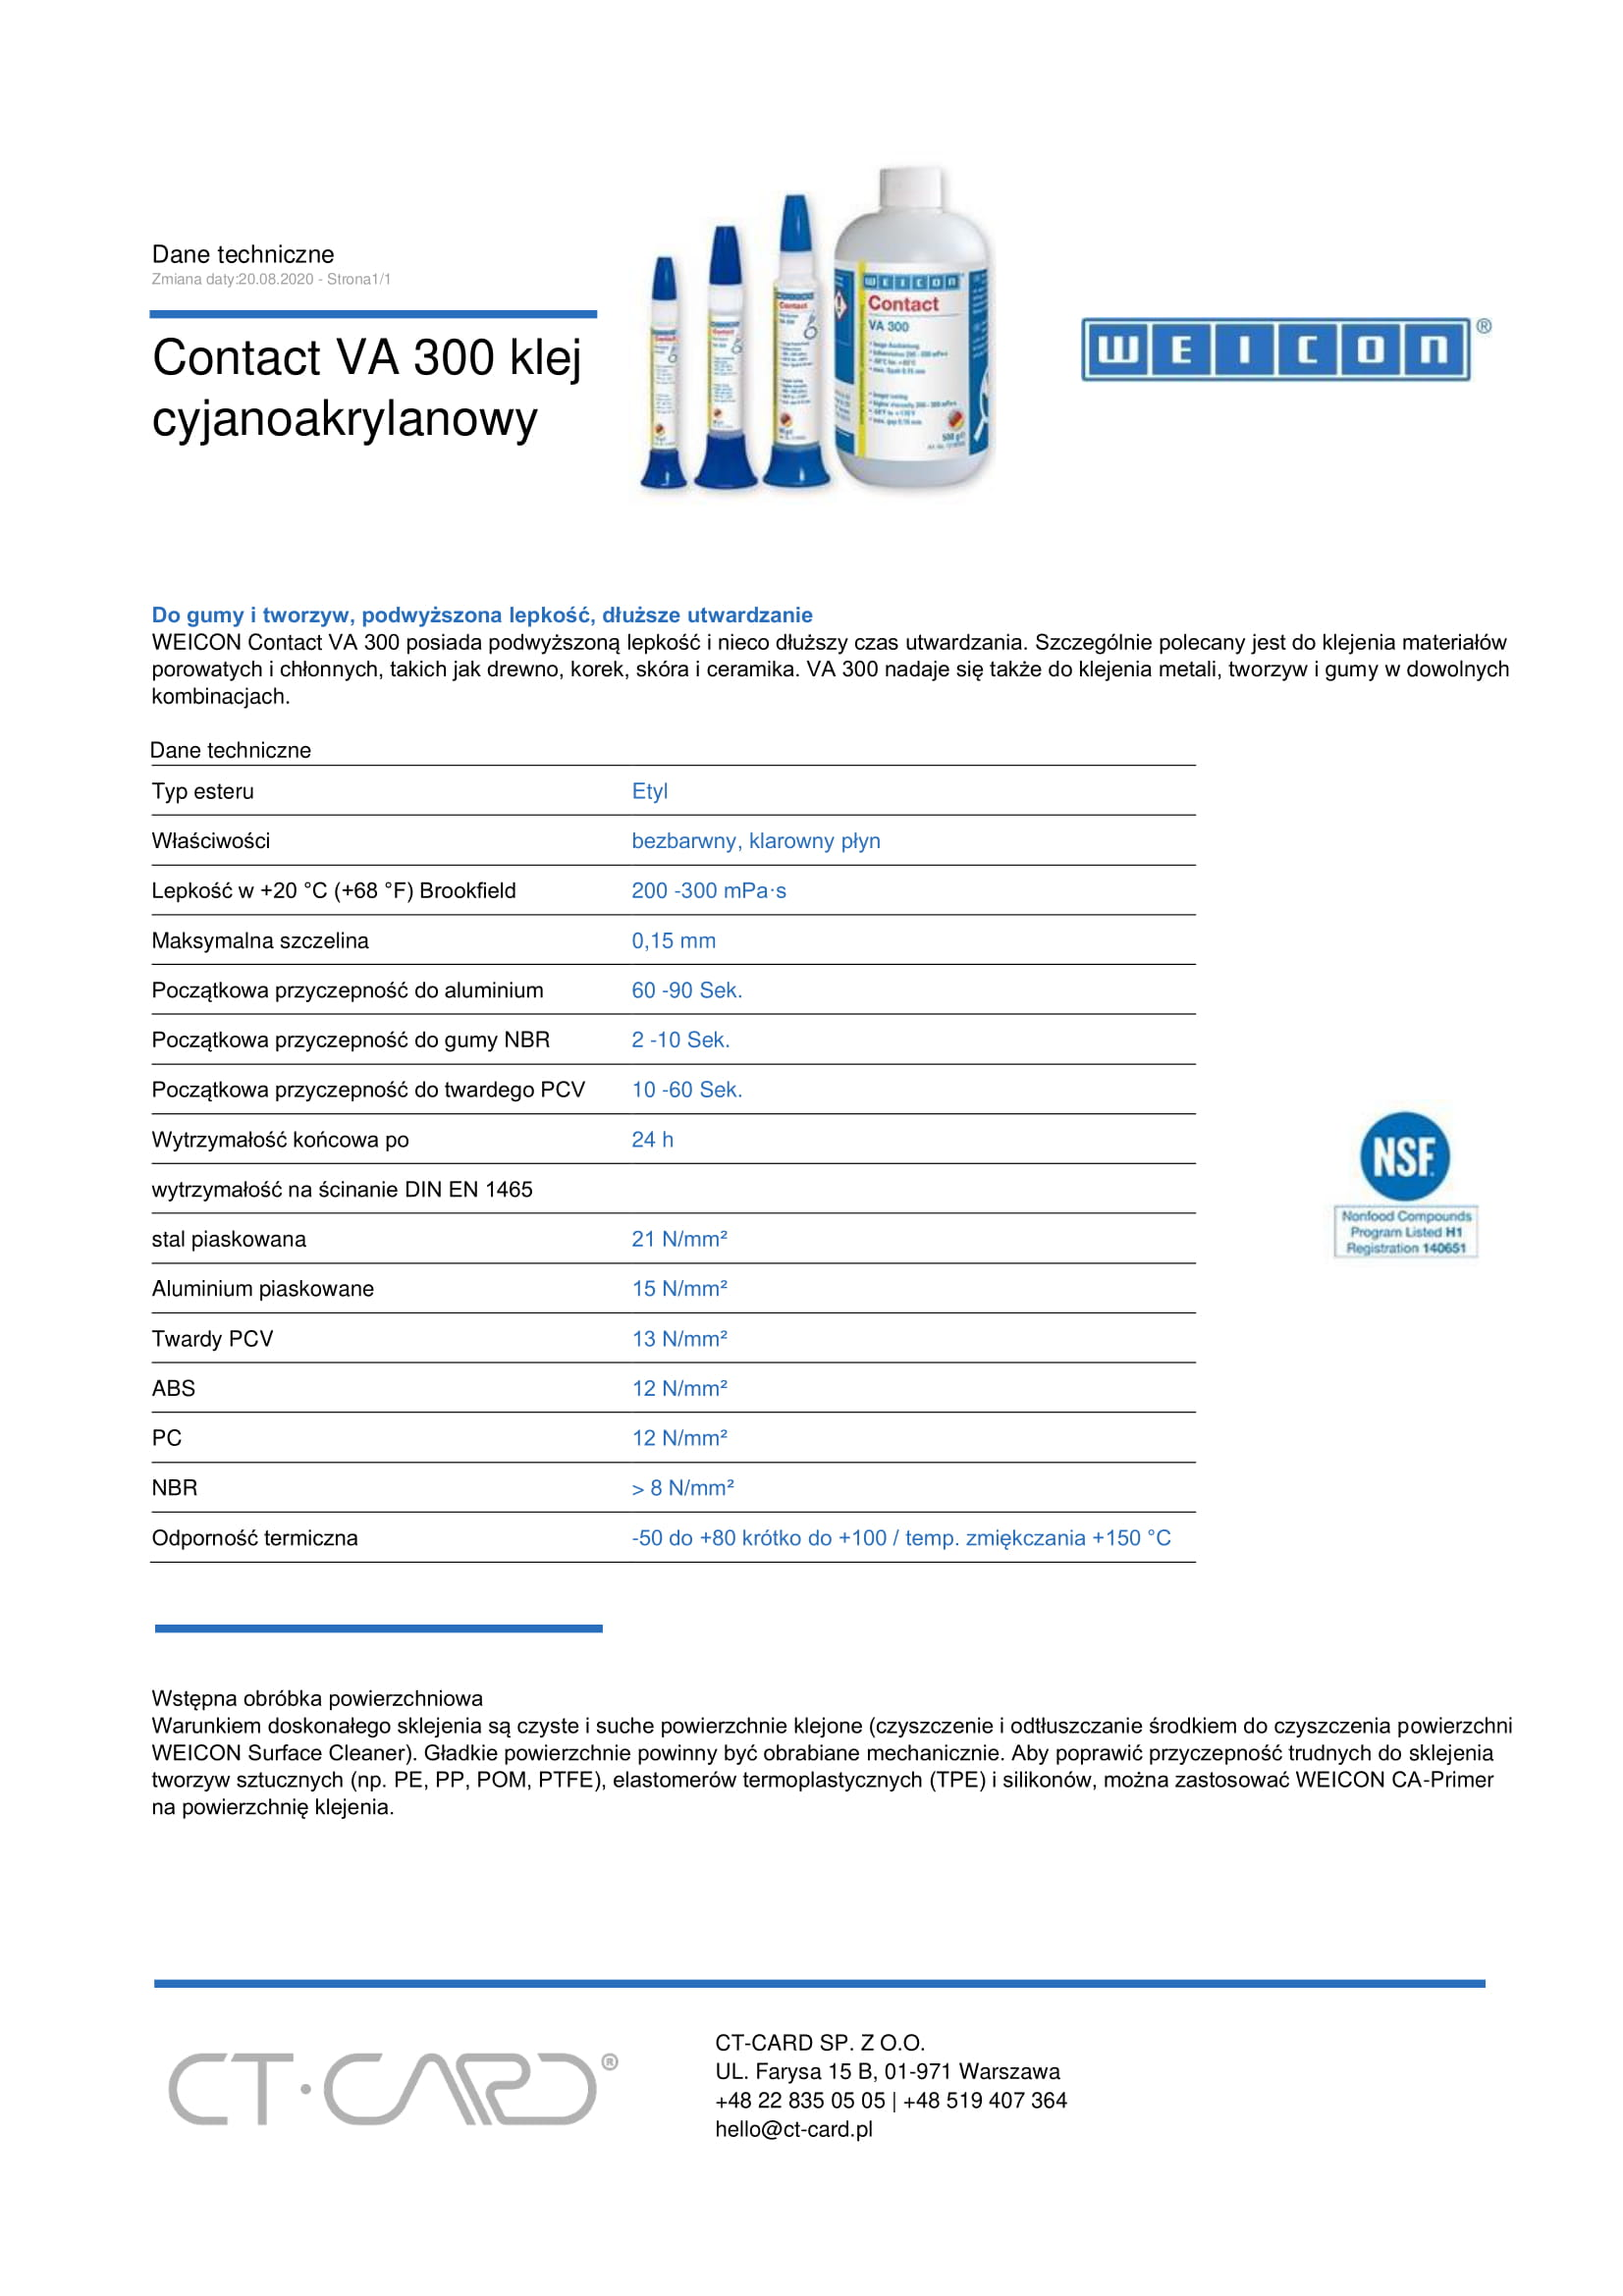 Contact VA 300 klej cyjanoakrylanowy-1